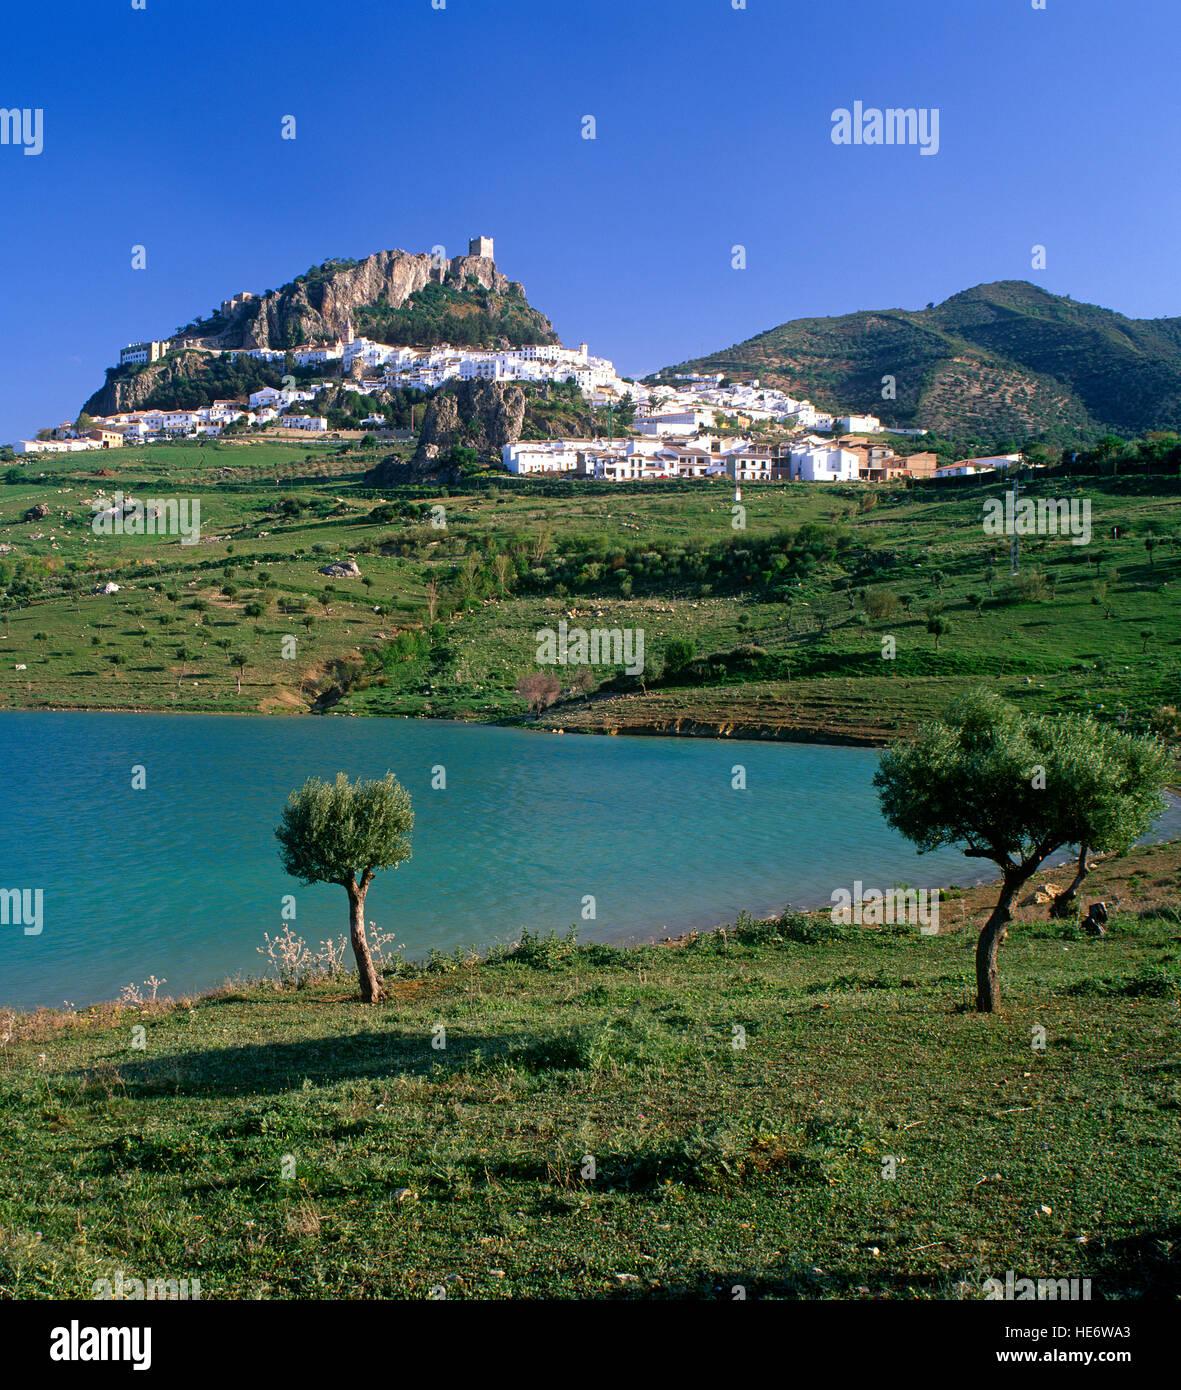 Zahara de la Sierra, Andalucia, Spain - Stock Image